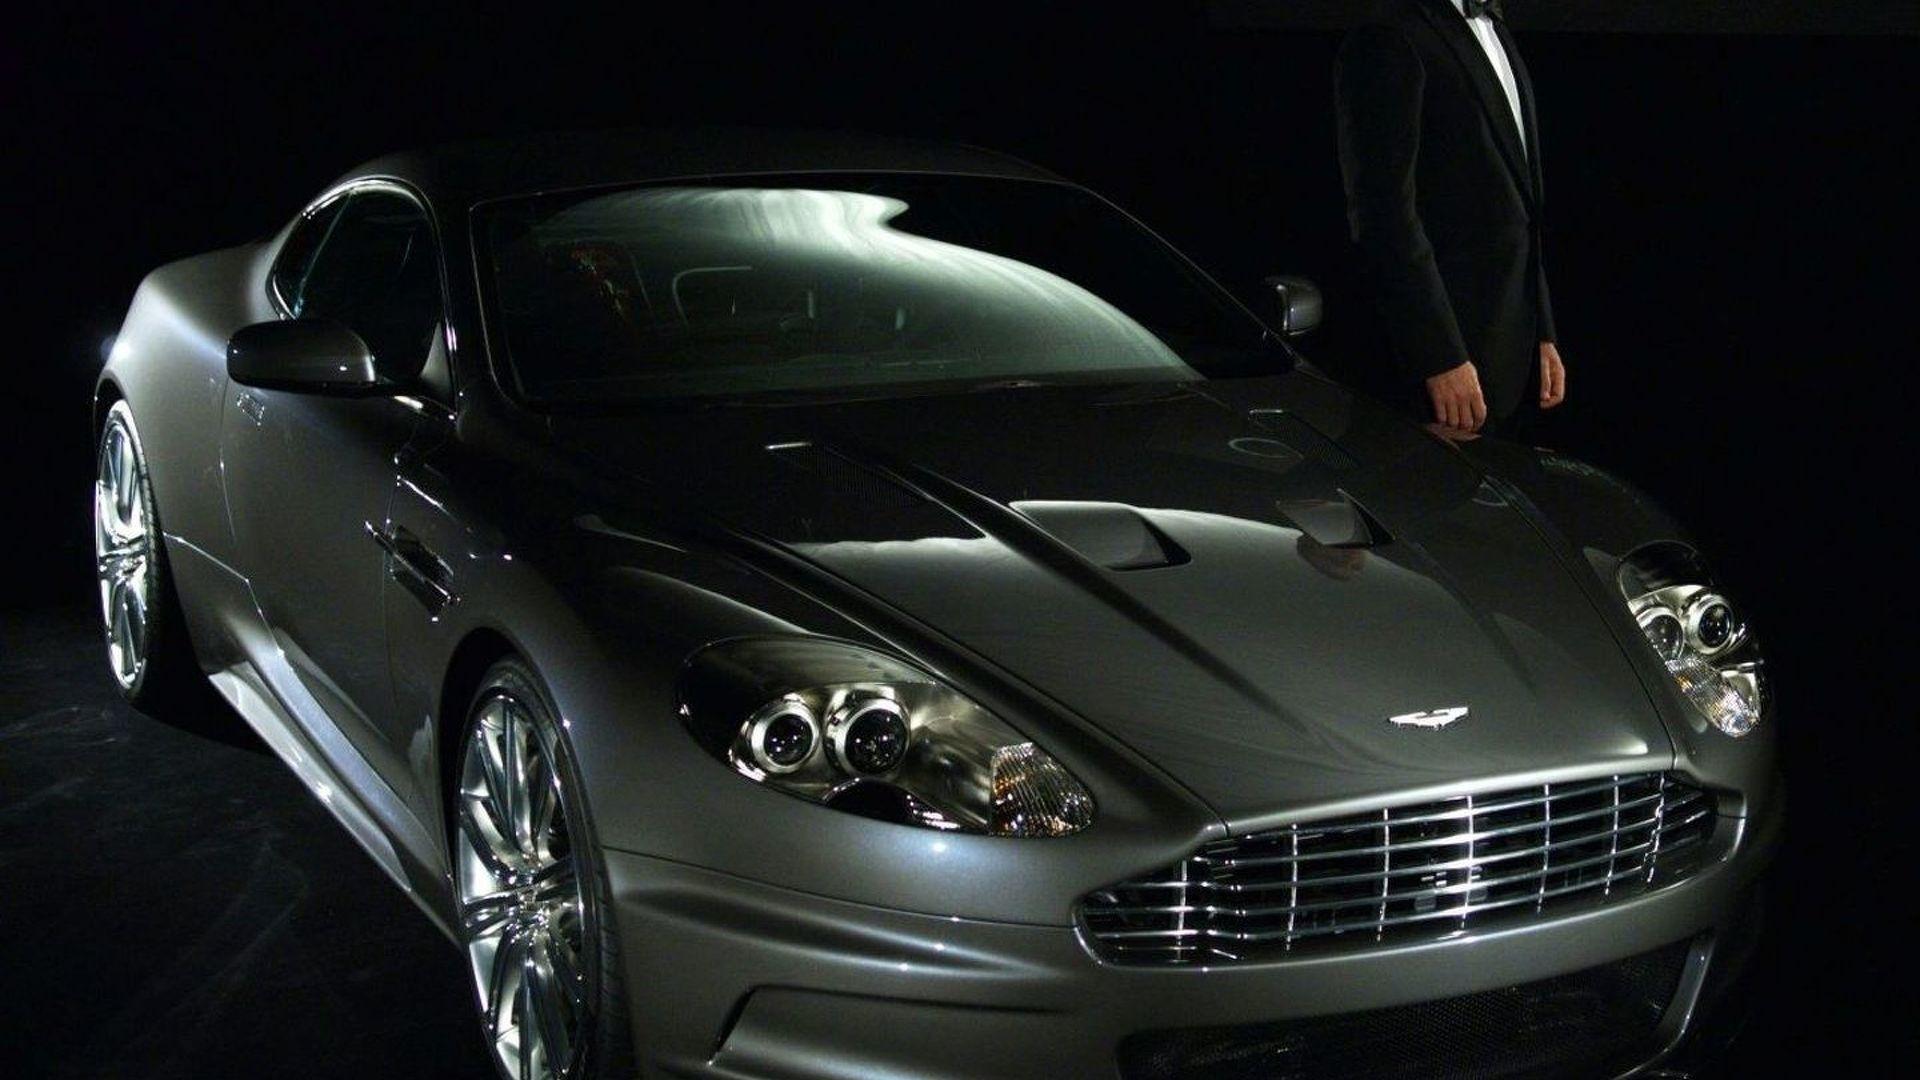 Next Bond Car: Aston Martin DBS